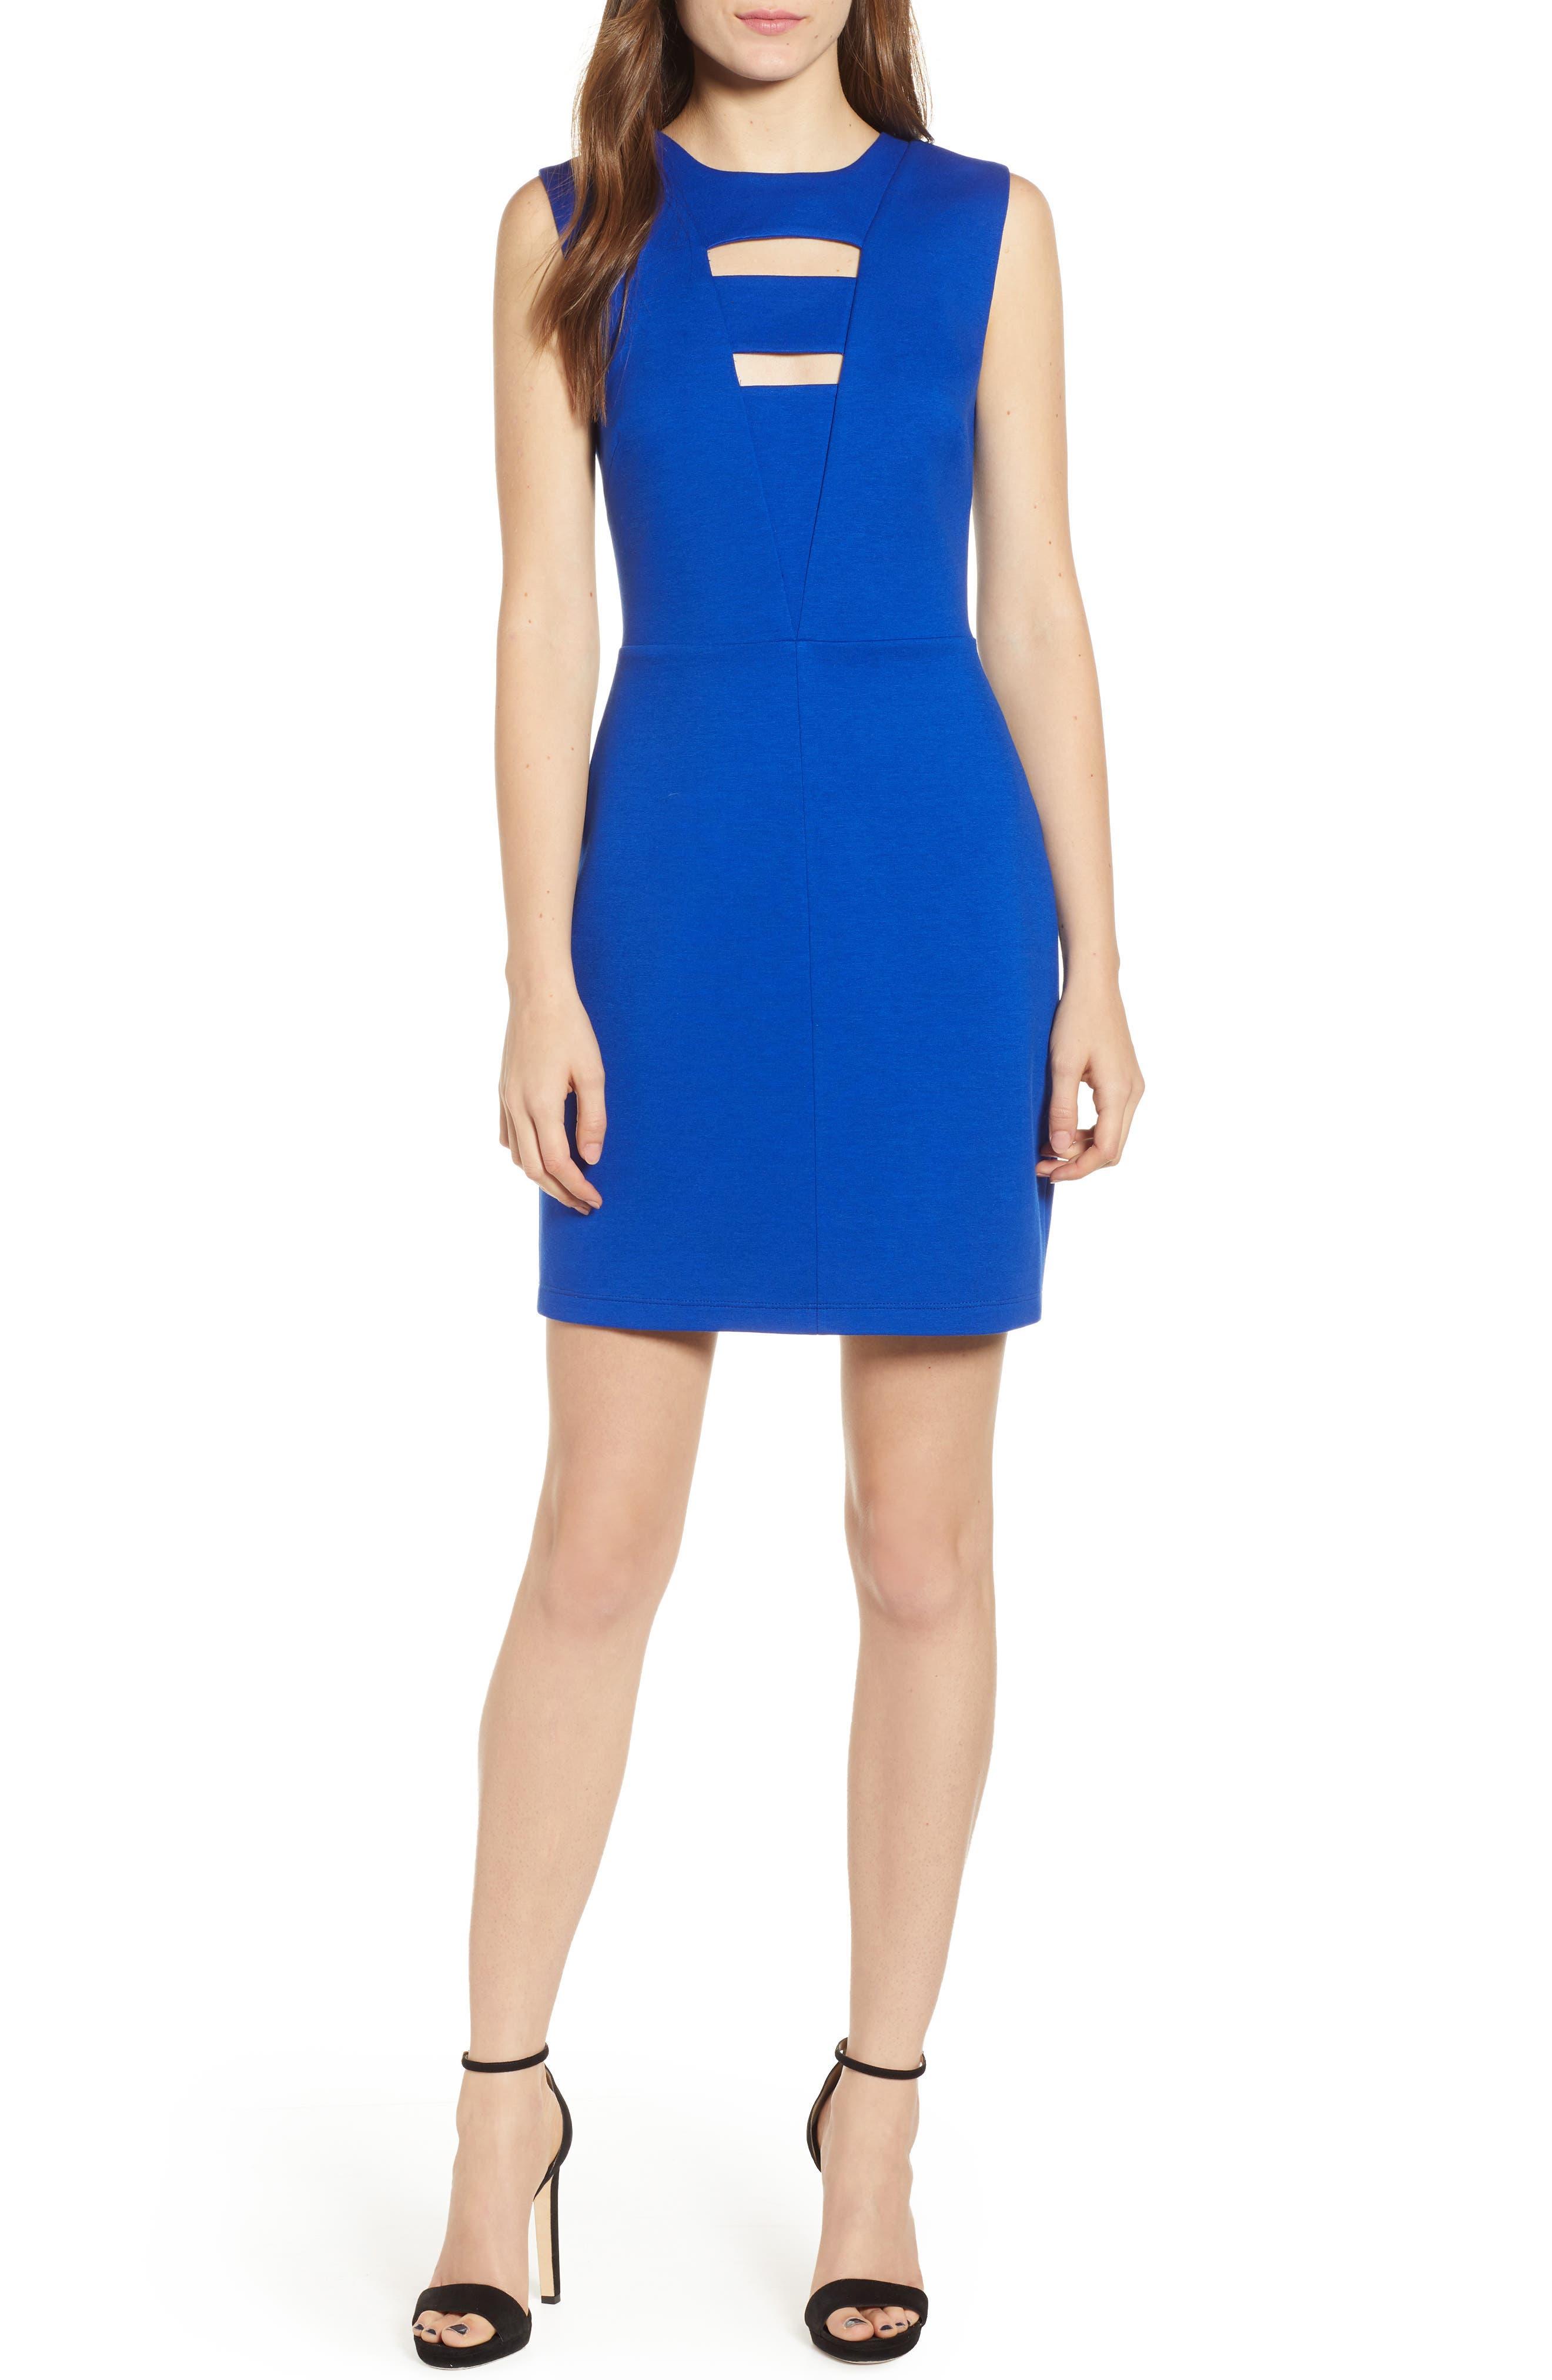 Bailey 44 No Love Ponte Knit Dress, Blue